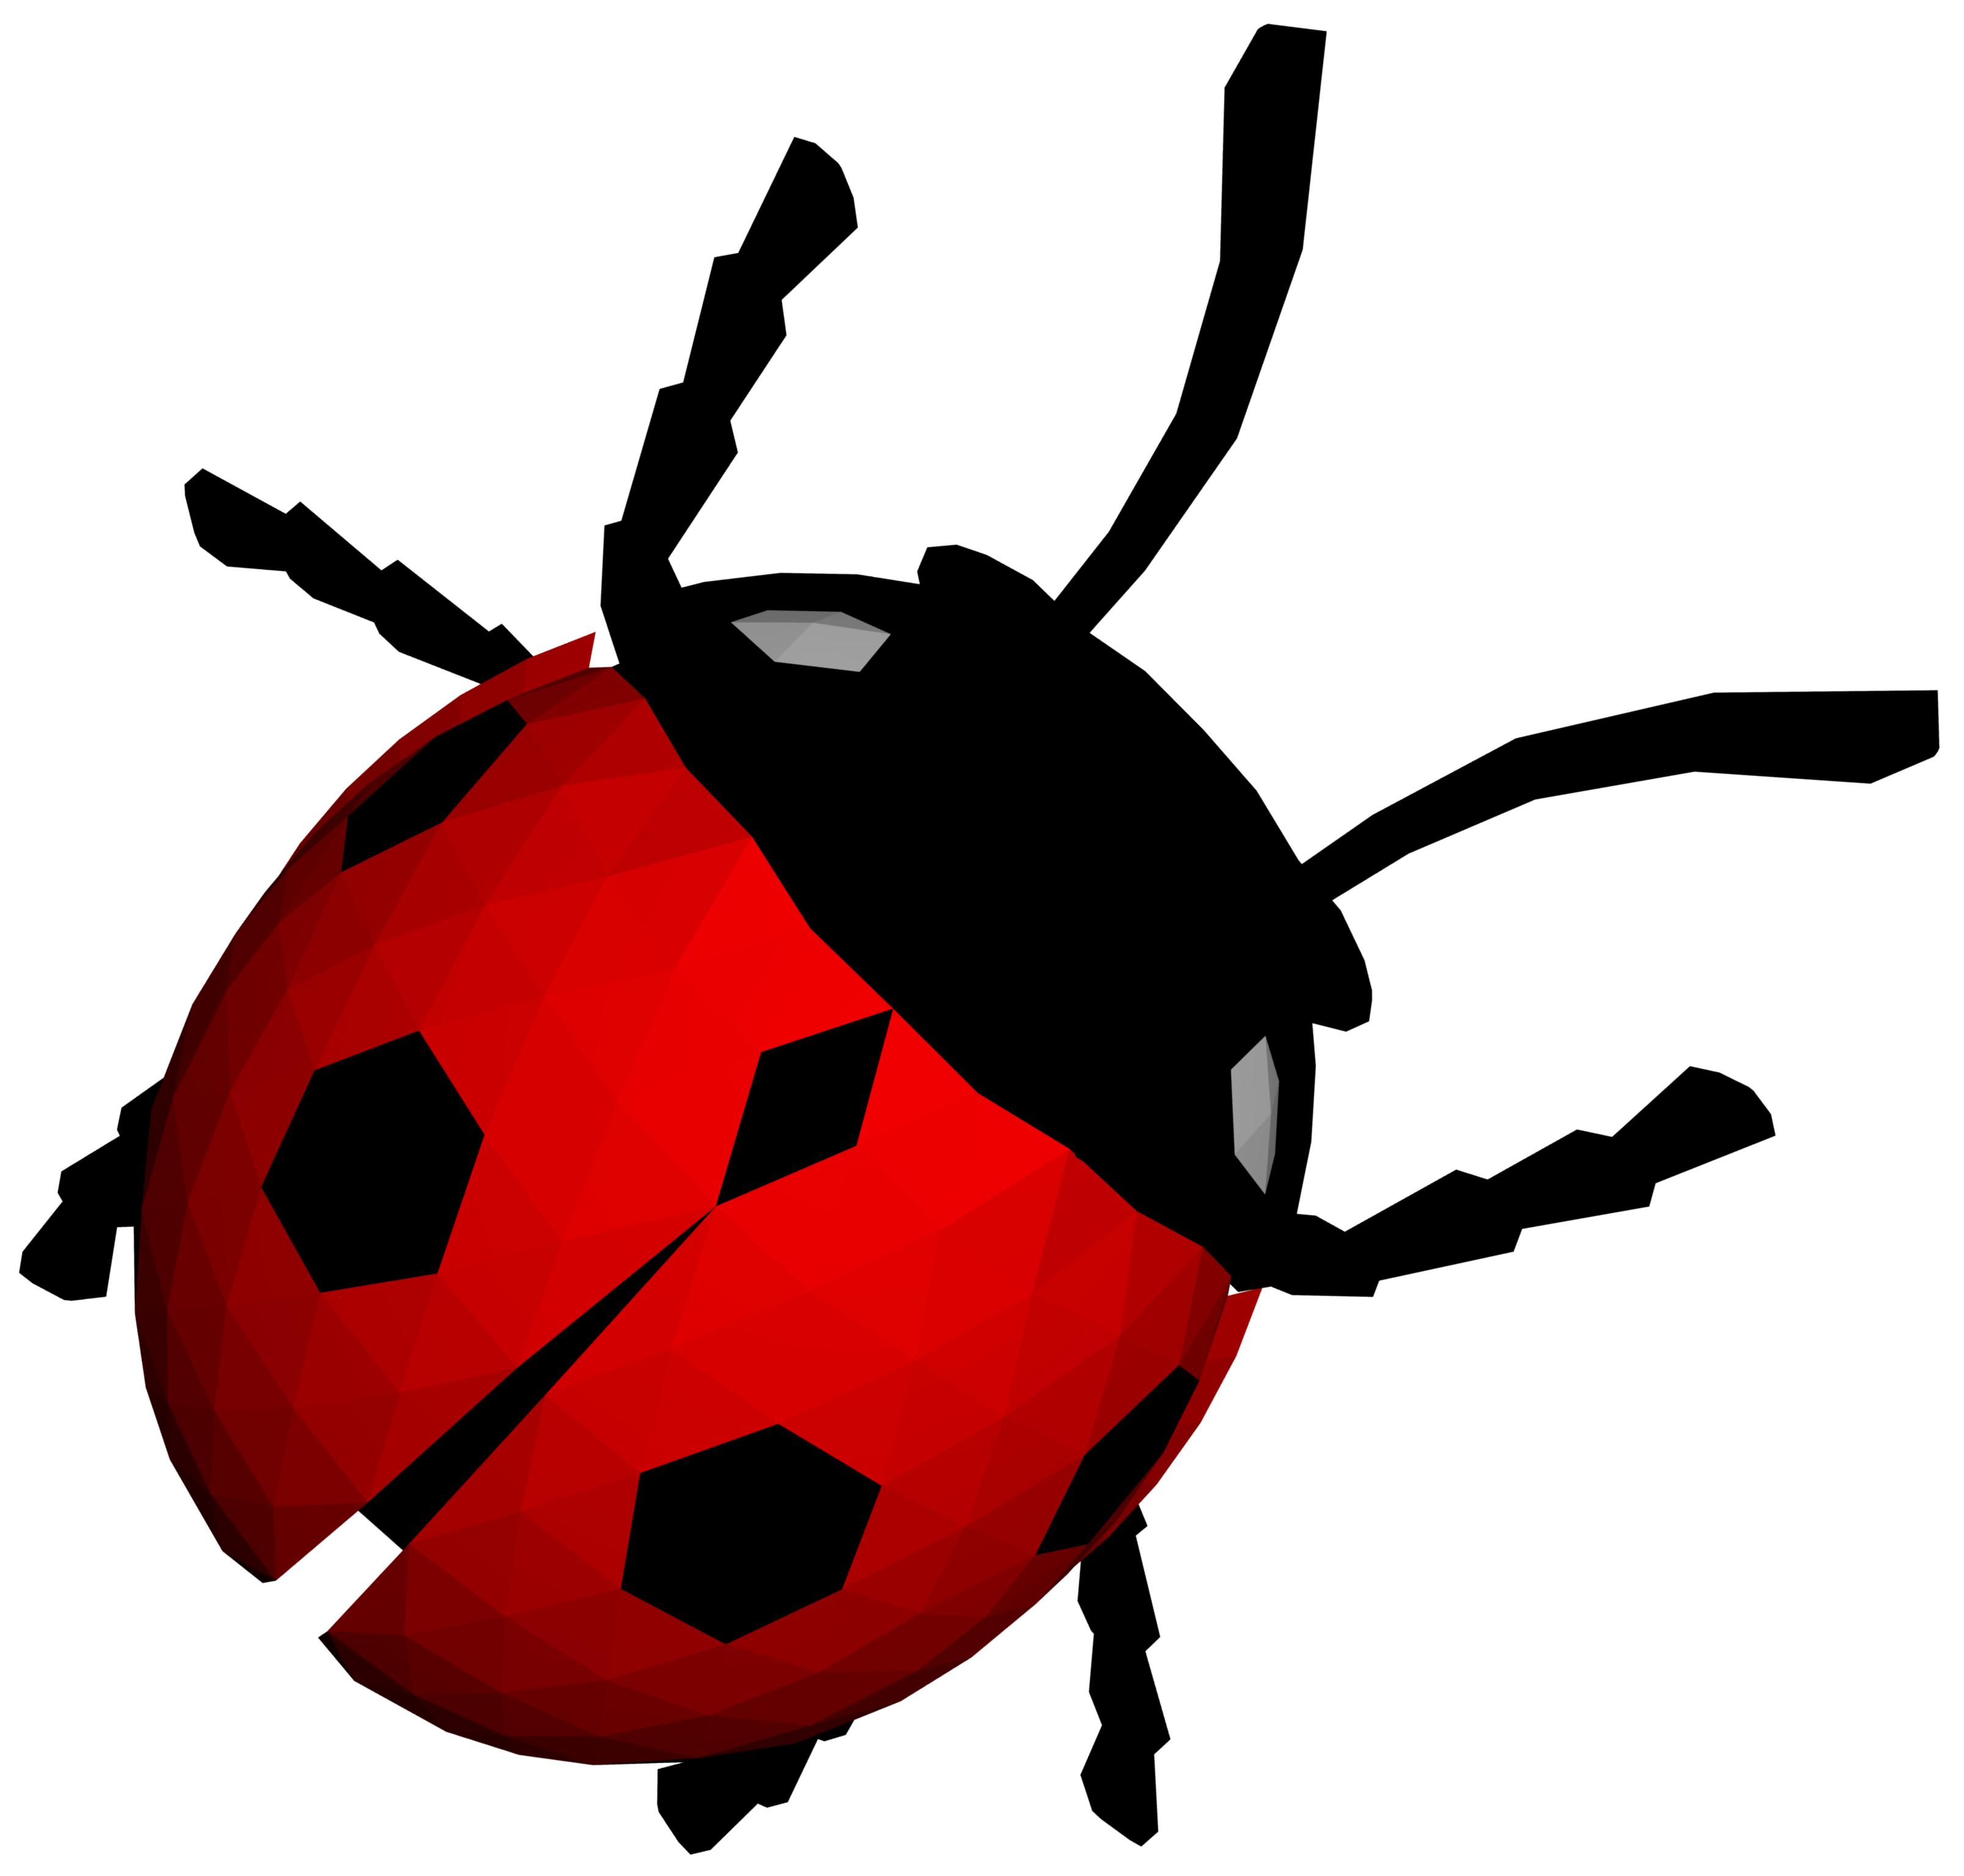 Png image free download. Ladybug clipart dead